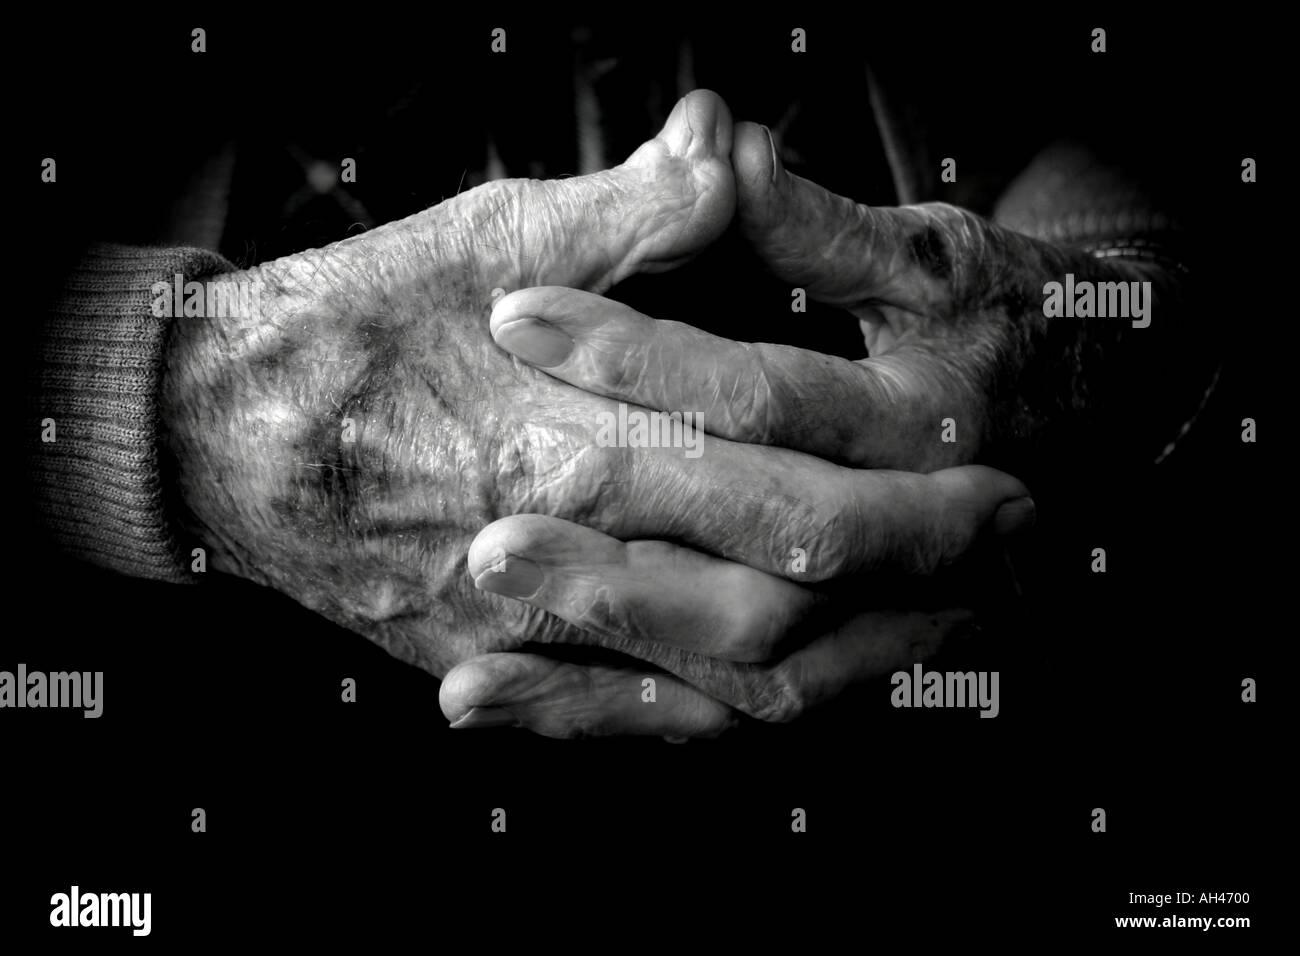 Elderly mans hands - Stock Image